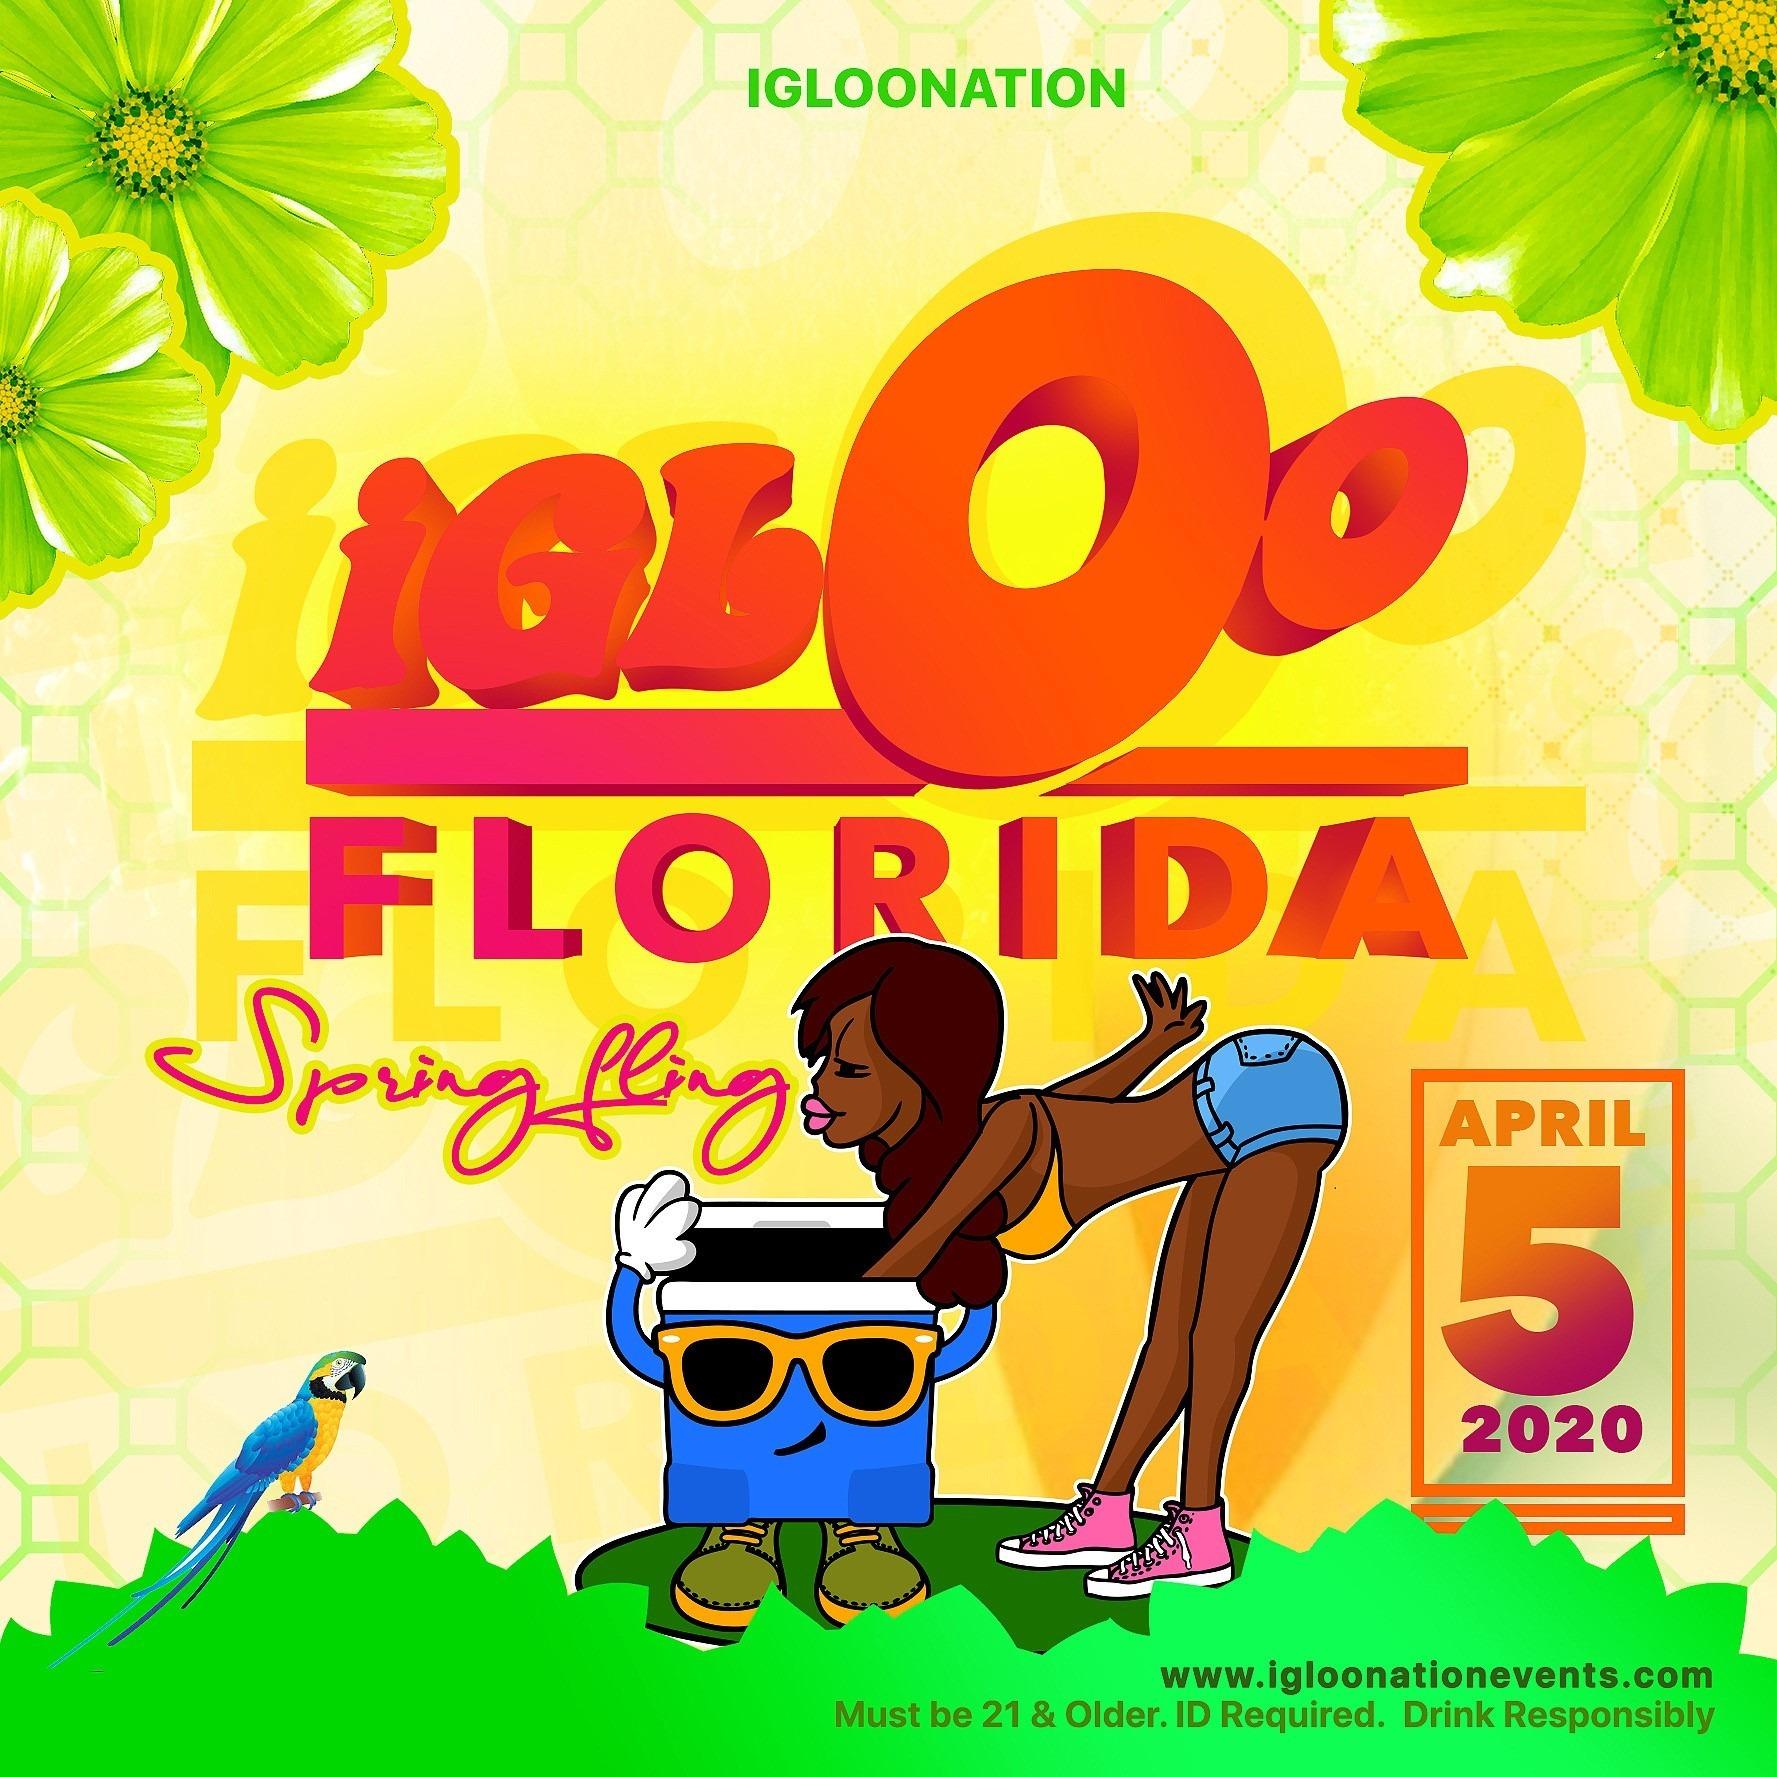 IGLOO - Florida Spring Fling